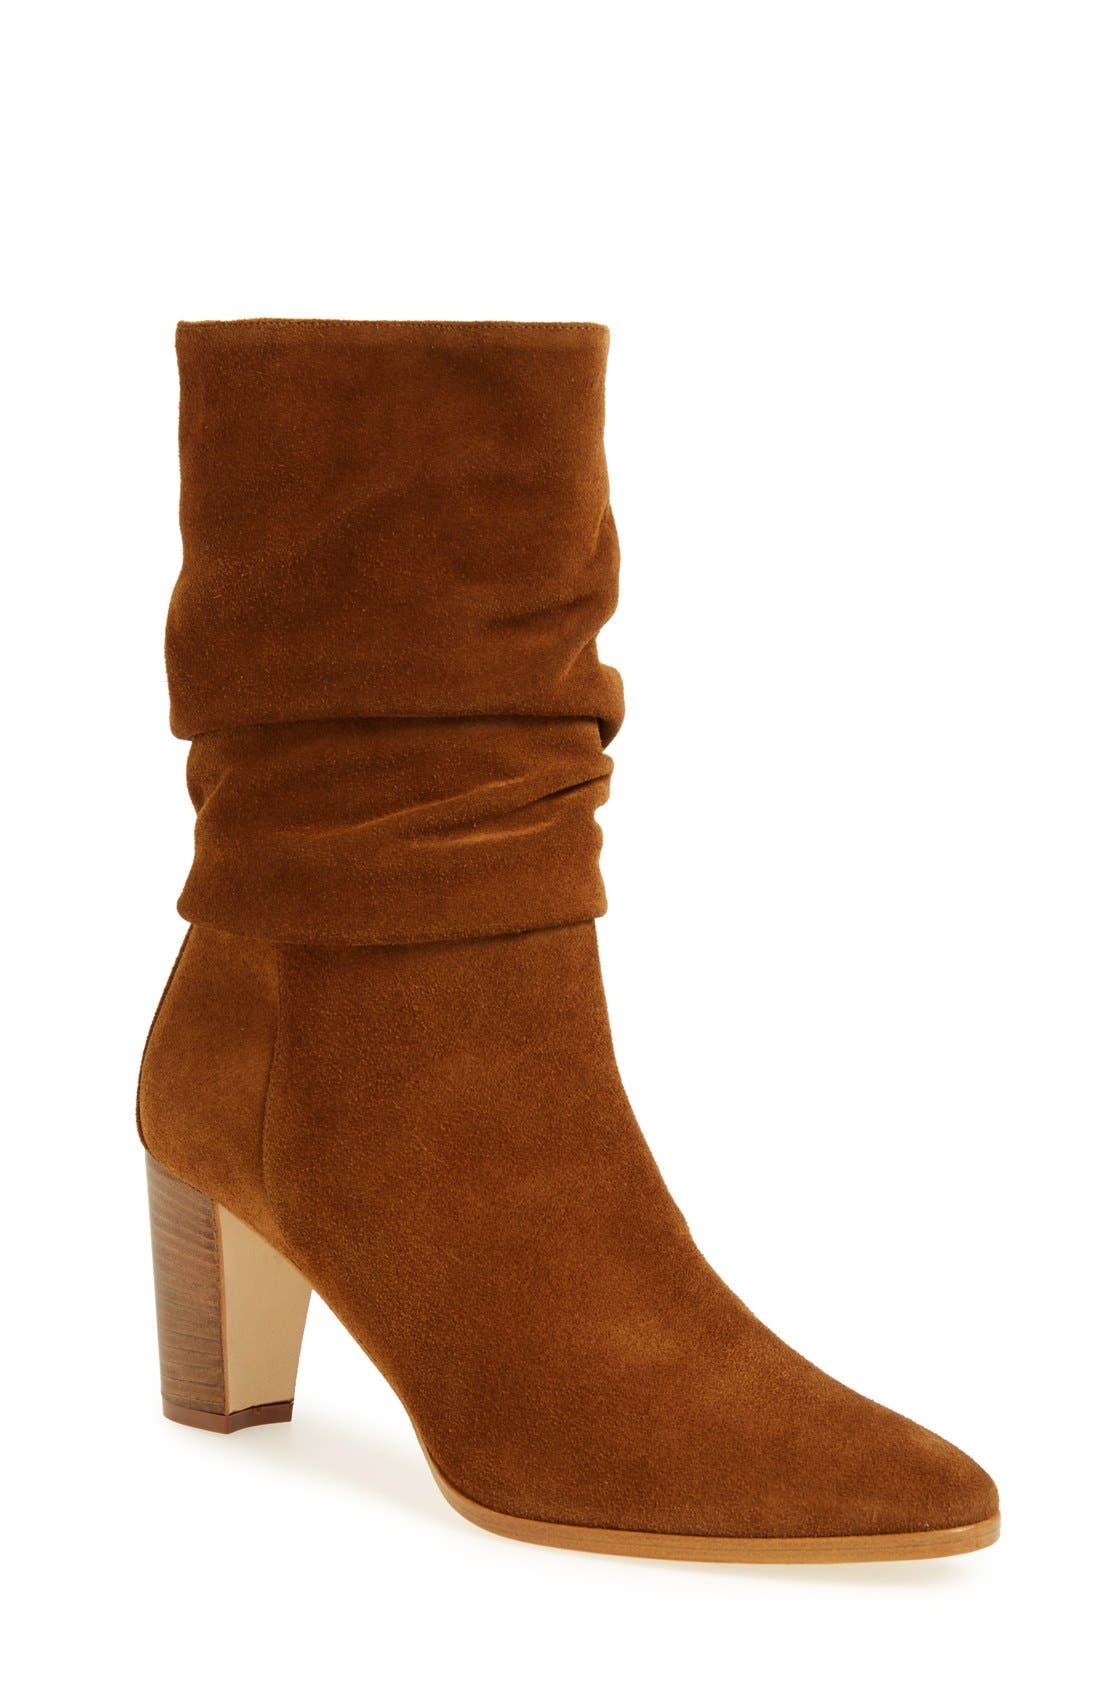 Alternate Image 1 Selected - Manolo Blahnik Slouch Boot (Women)